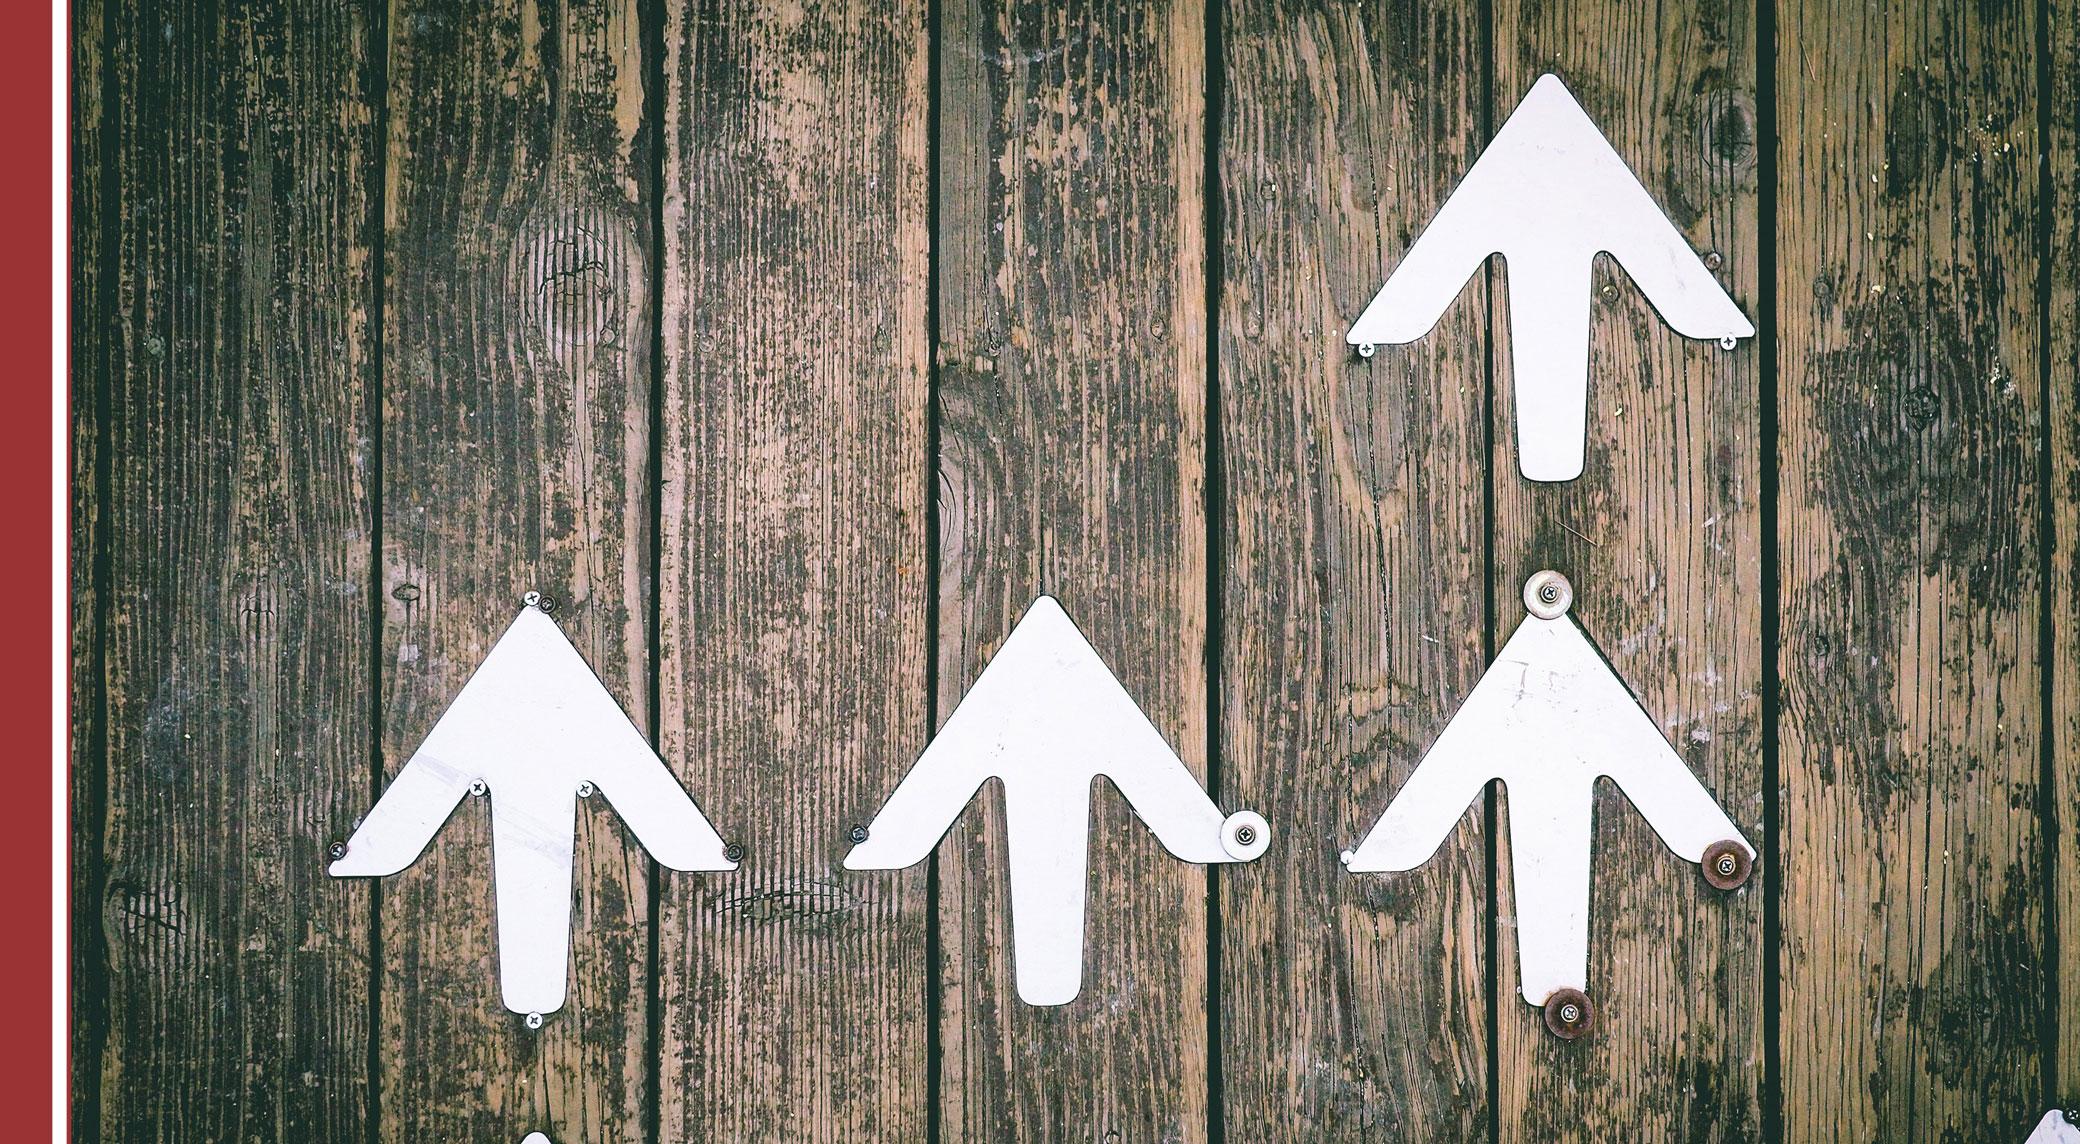 ventaja-competitiva ¿Cómo lograr una ventaja competitiva?